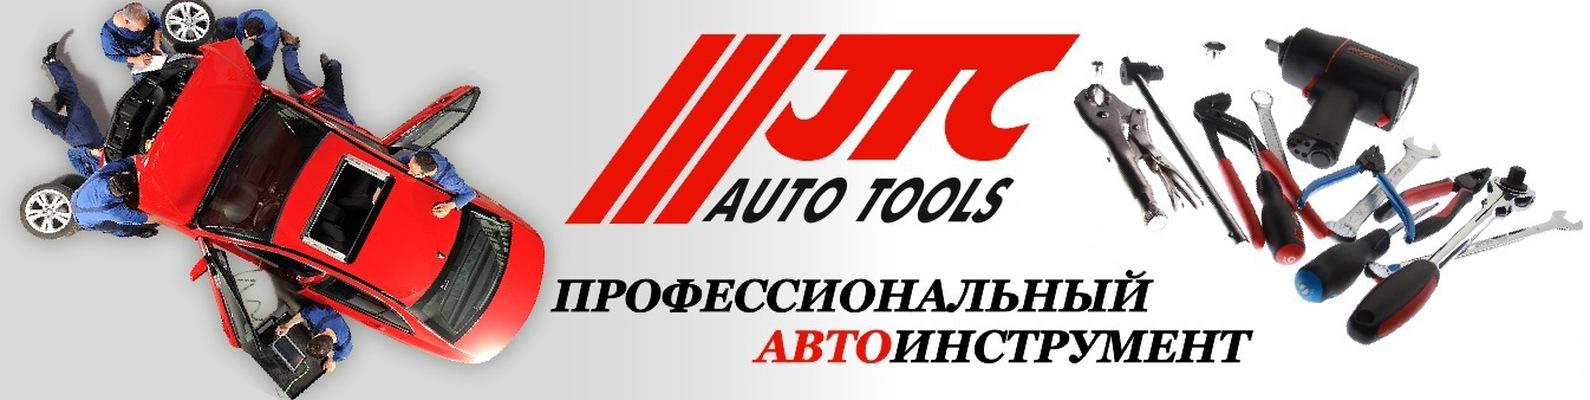 JTC Auto Tools - фото soEZmPbLndk.jpg